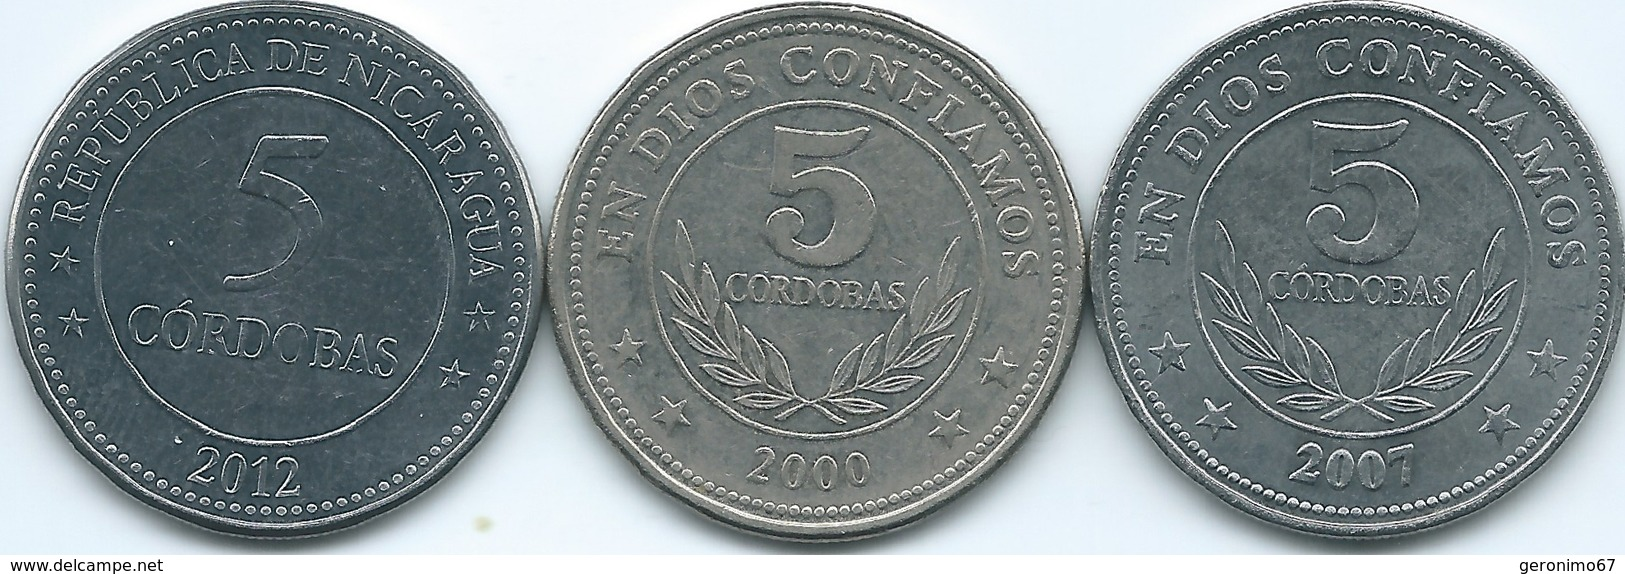 Nicaragua - 5 Córdoba - 2000 (KM90) 2007 (KM90.1) 2012 - Centennial Of Córdoba (KM111) - Nicaragua